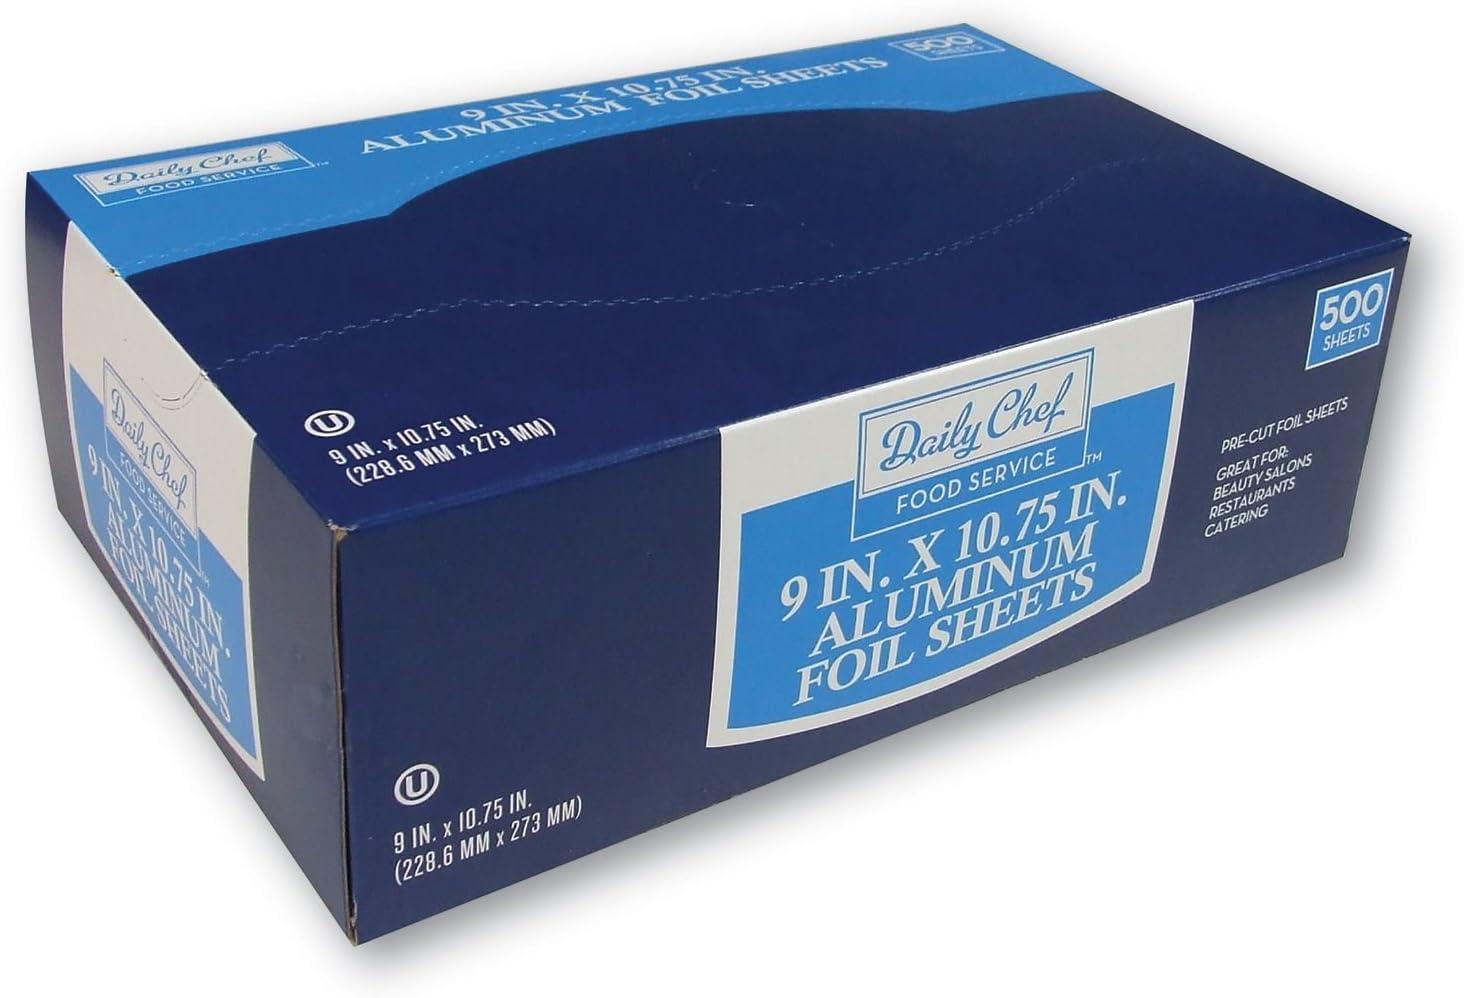 "Daily Chef Foil Sheets, 500 Count 22.9cm x 27.3 cm (9"" x 10 3/4"")"